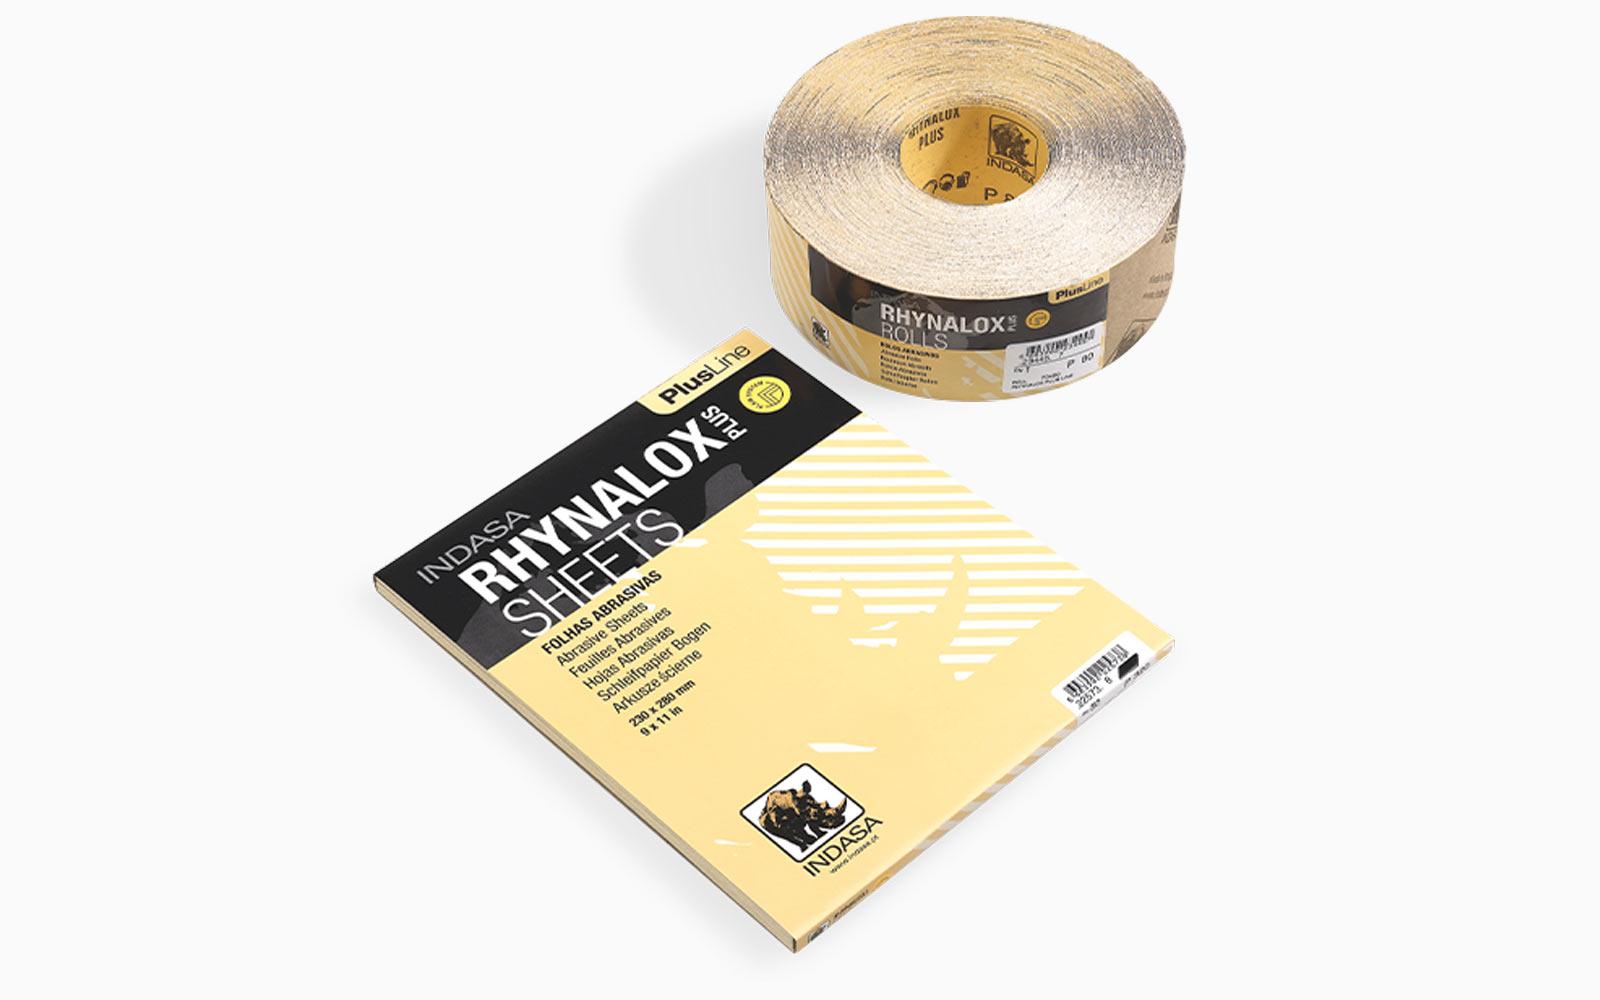 Abrasivos INDASA Rhynalox Plus Line